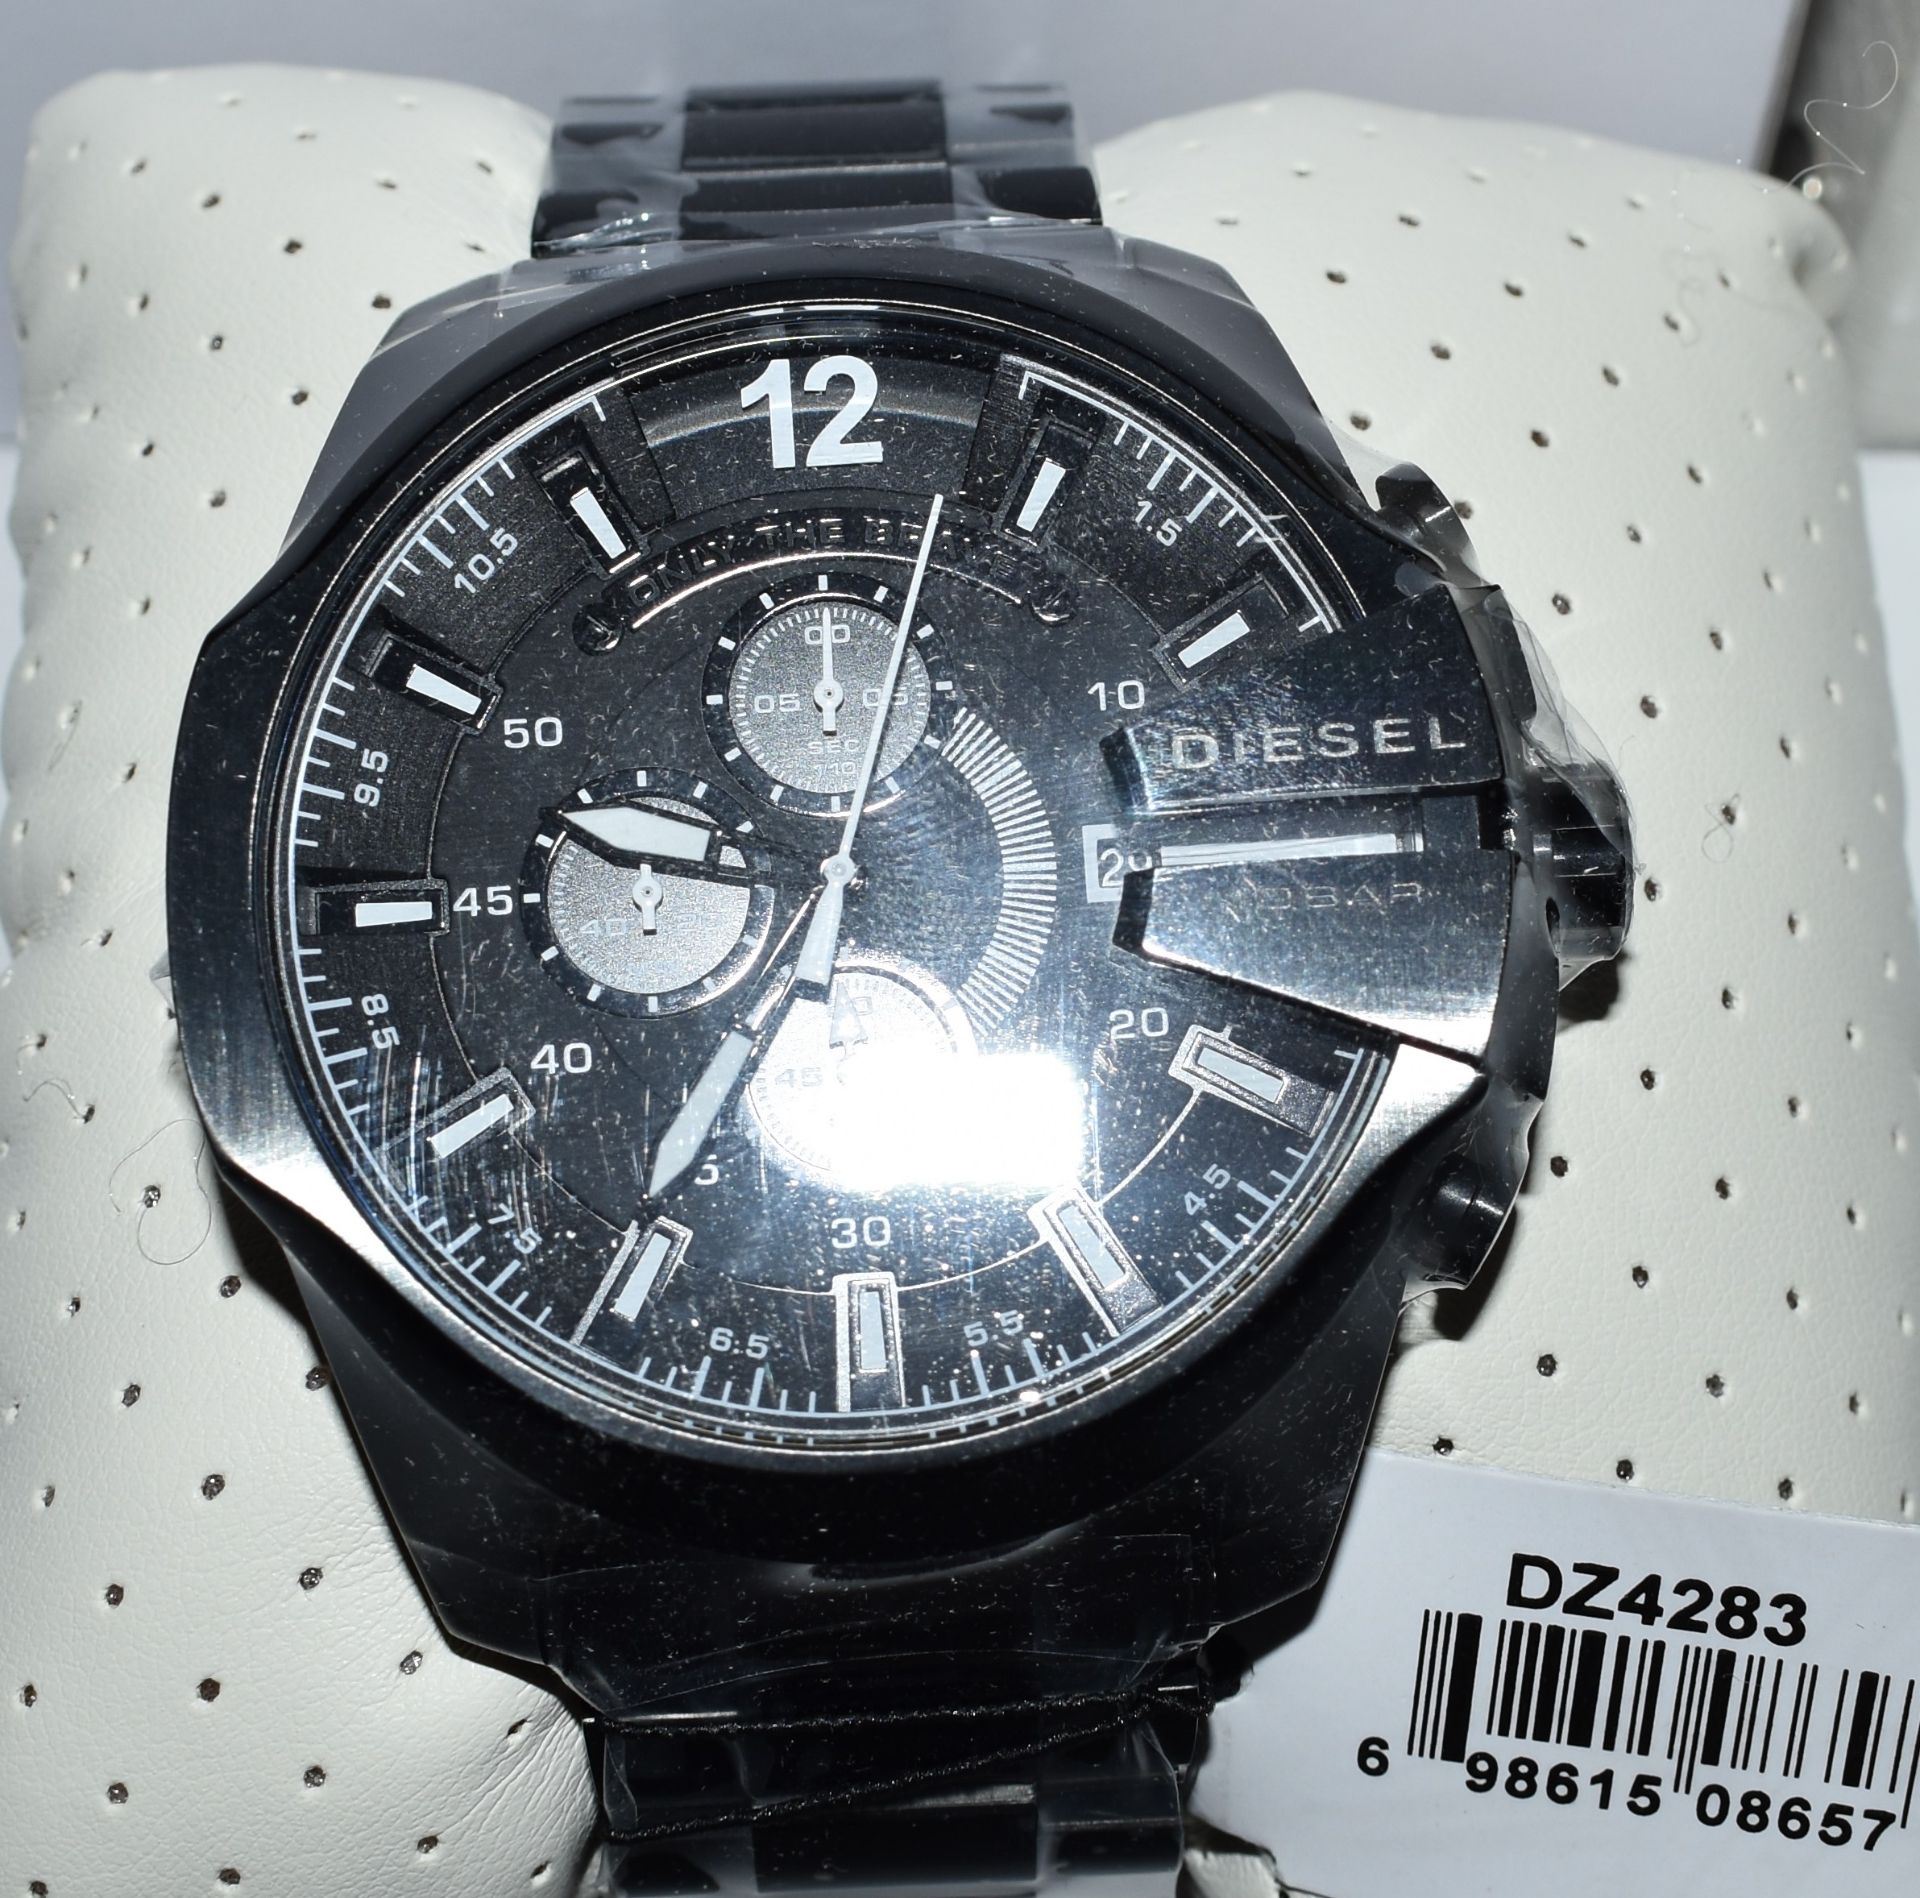 Diesel Men's Watch DZ4283 - Image 3 of 3